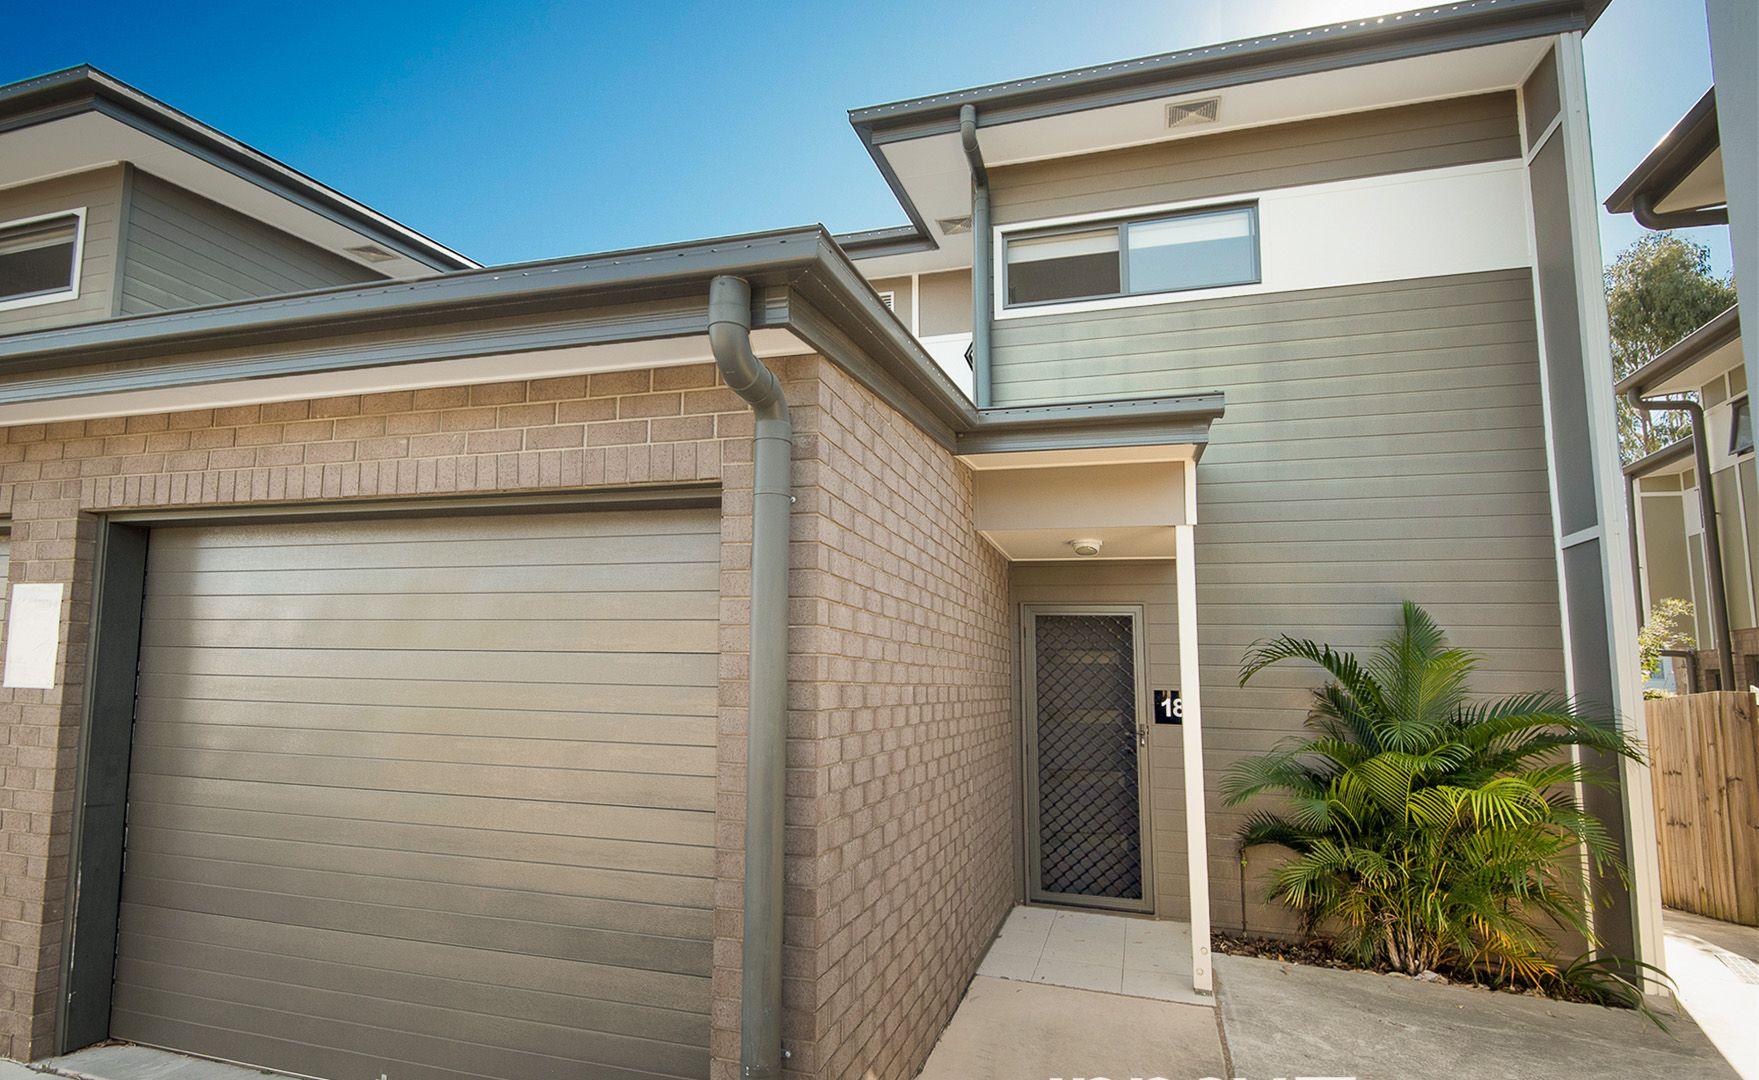 18/35 Lavender Place, Fitzgibbon QLD 4018, Image 1